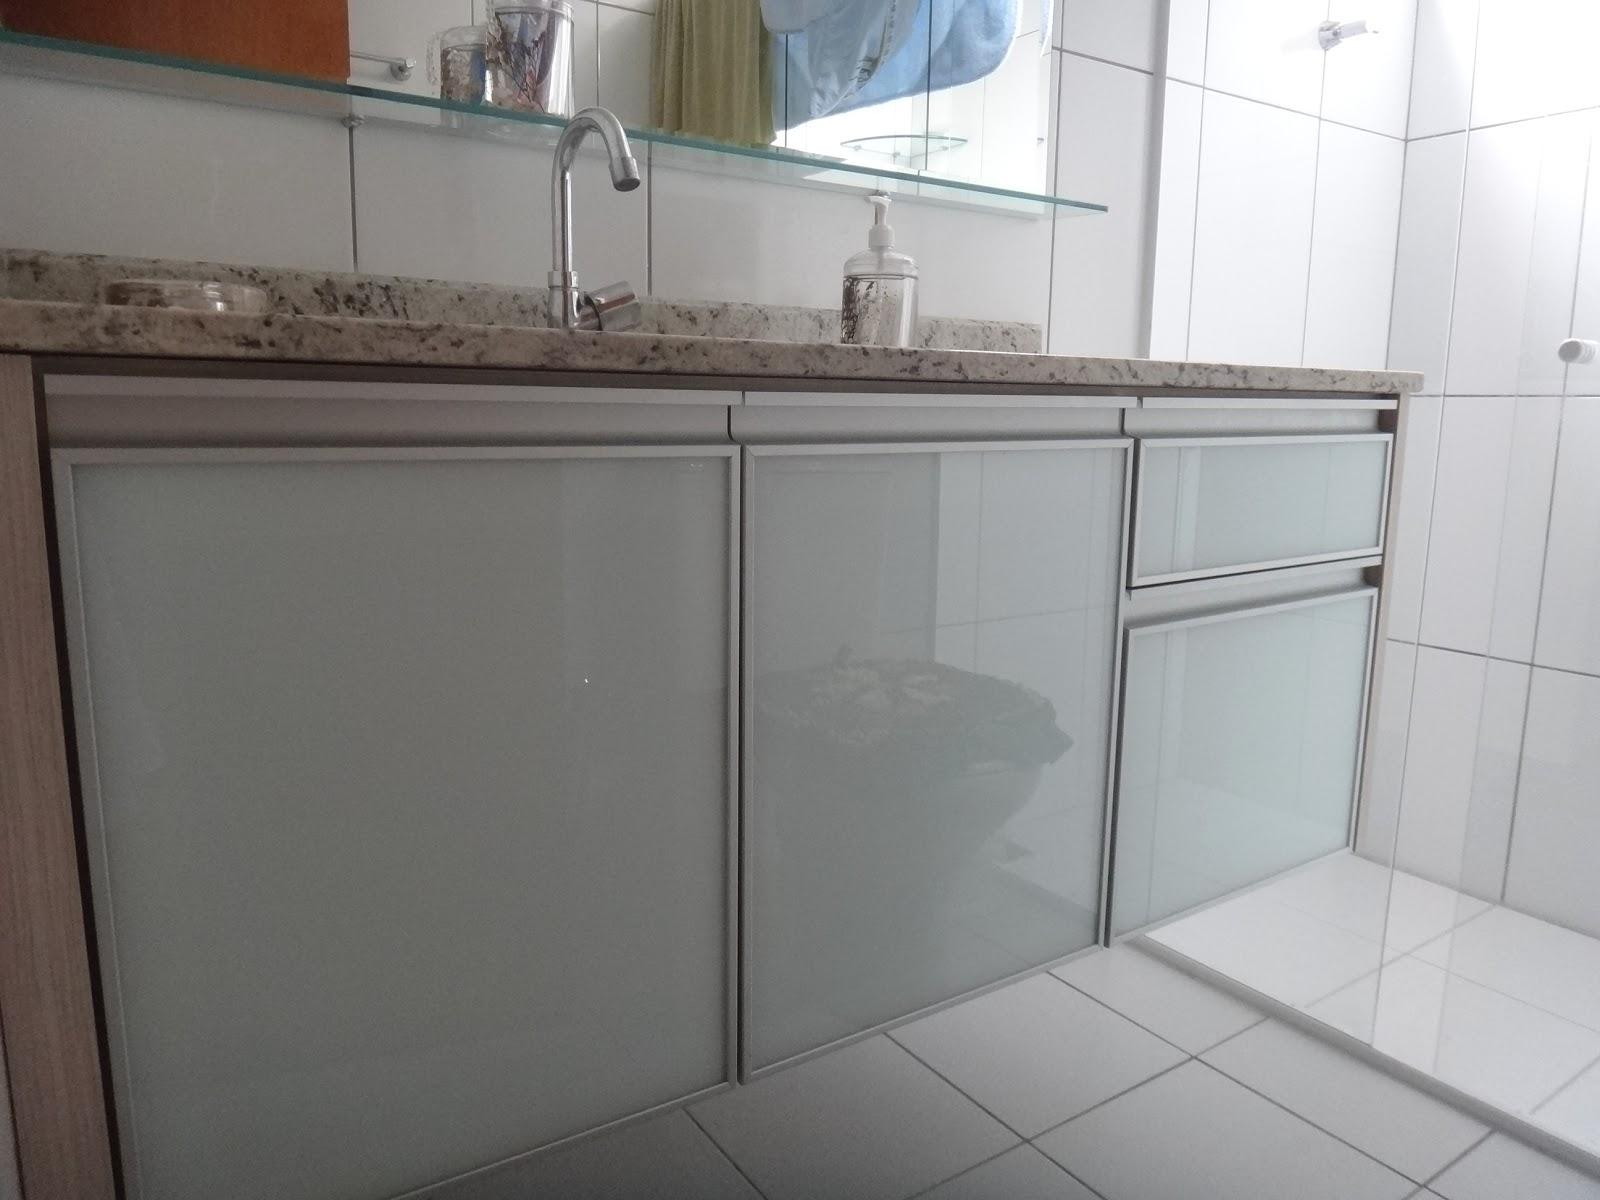 Belenetto Marcenaria Personalizada: Banheiros com portas de vidro e  #5D4941 1600x1200 Armario Banheiro Aluminio